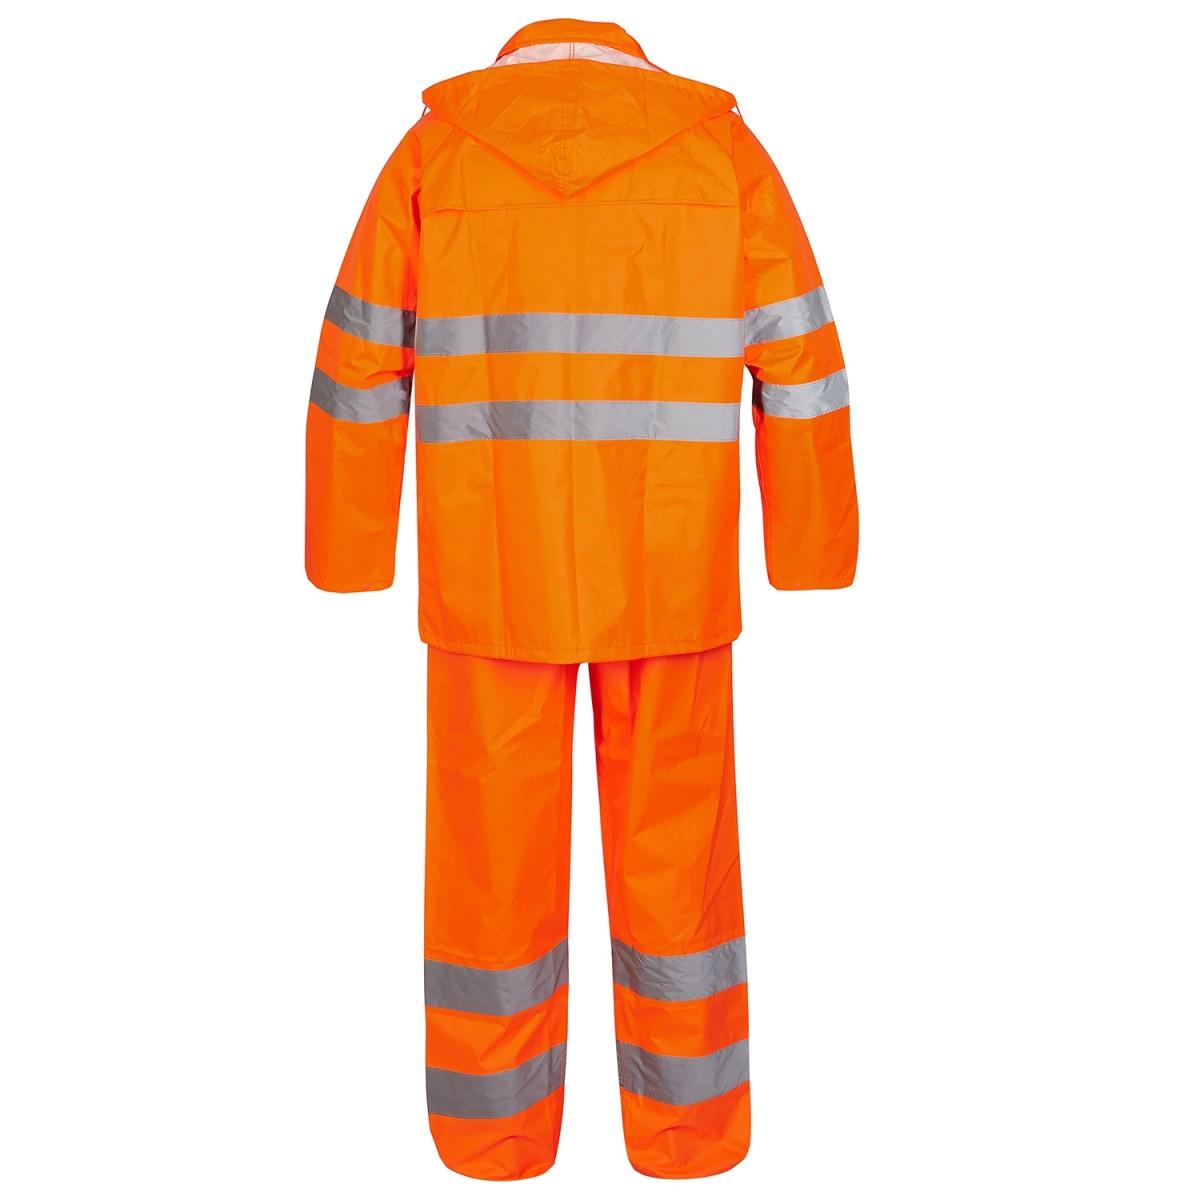 F. Engel Safety Regnsæt-33